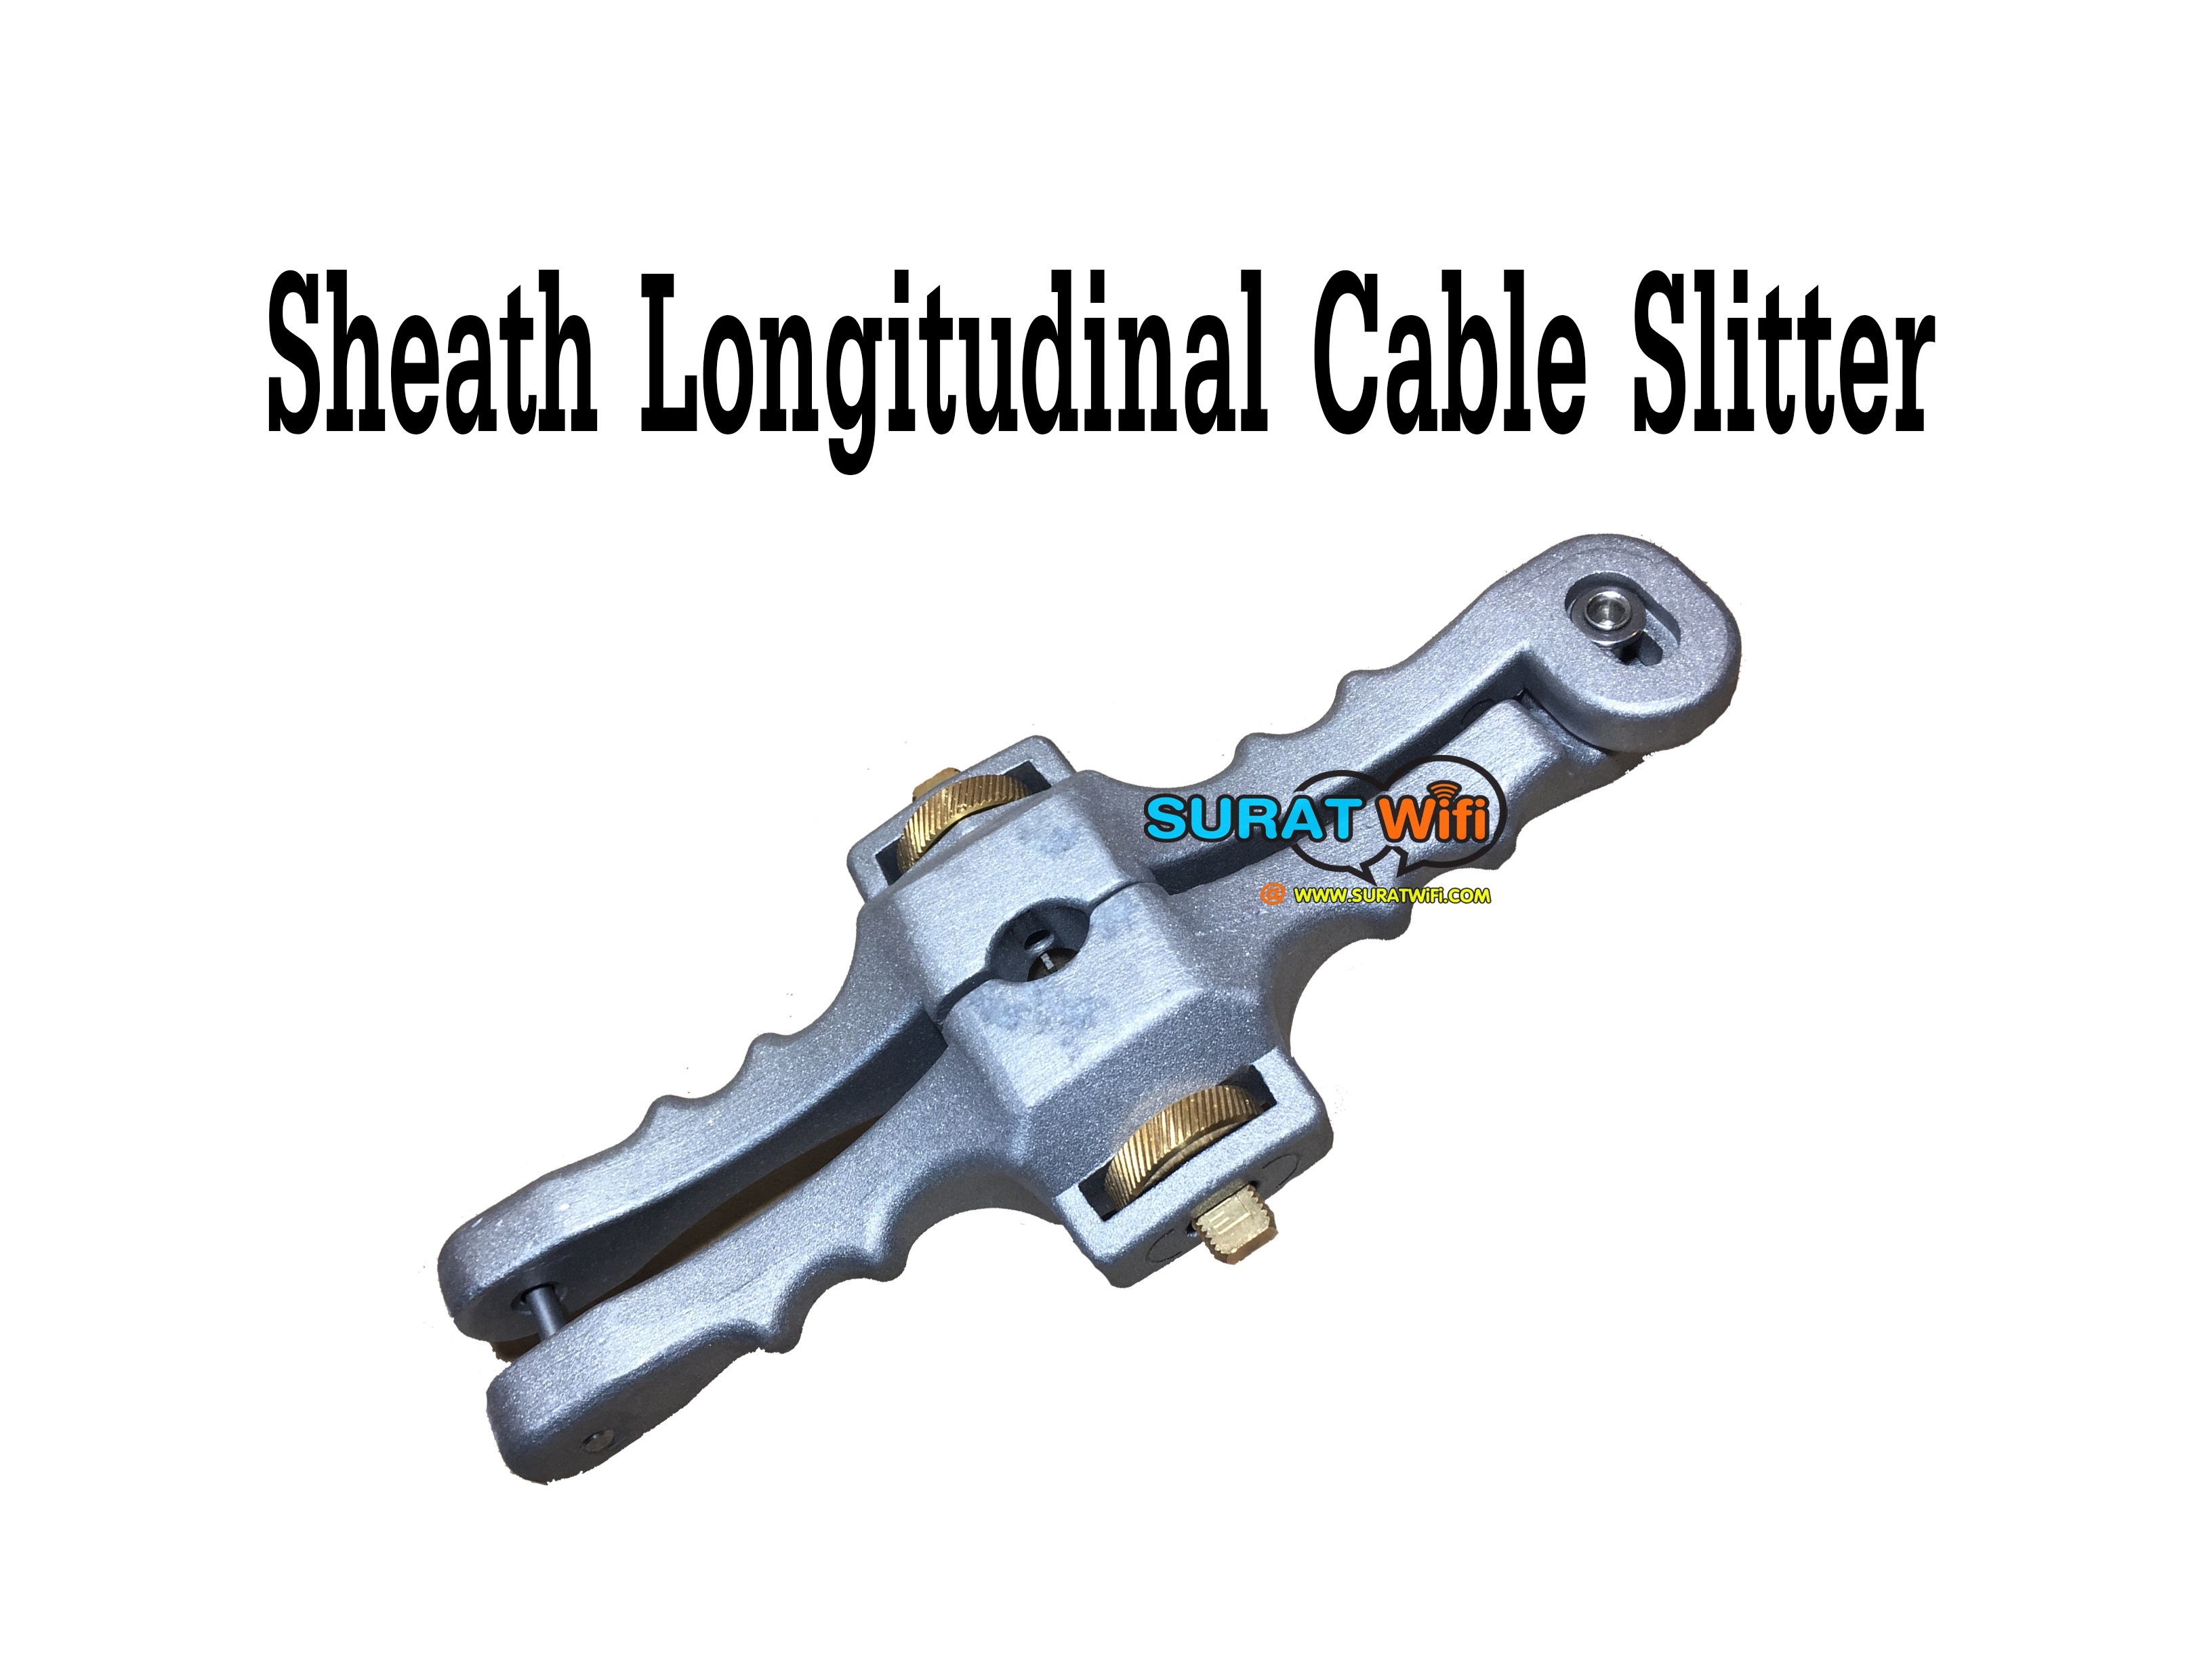 Sheath Longitudinal Cable Slitter